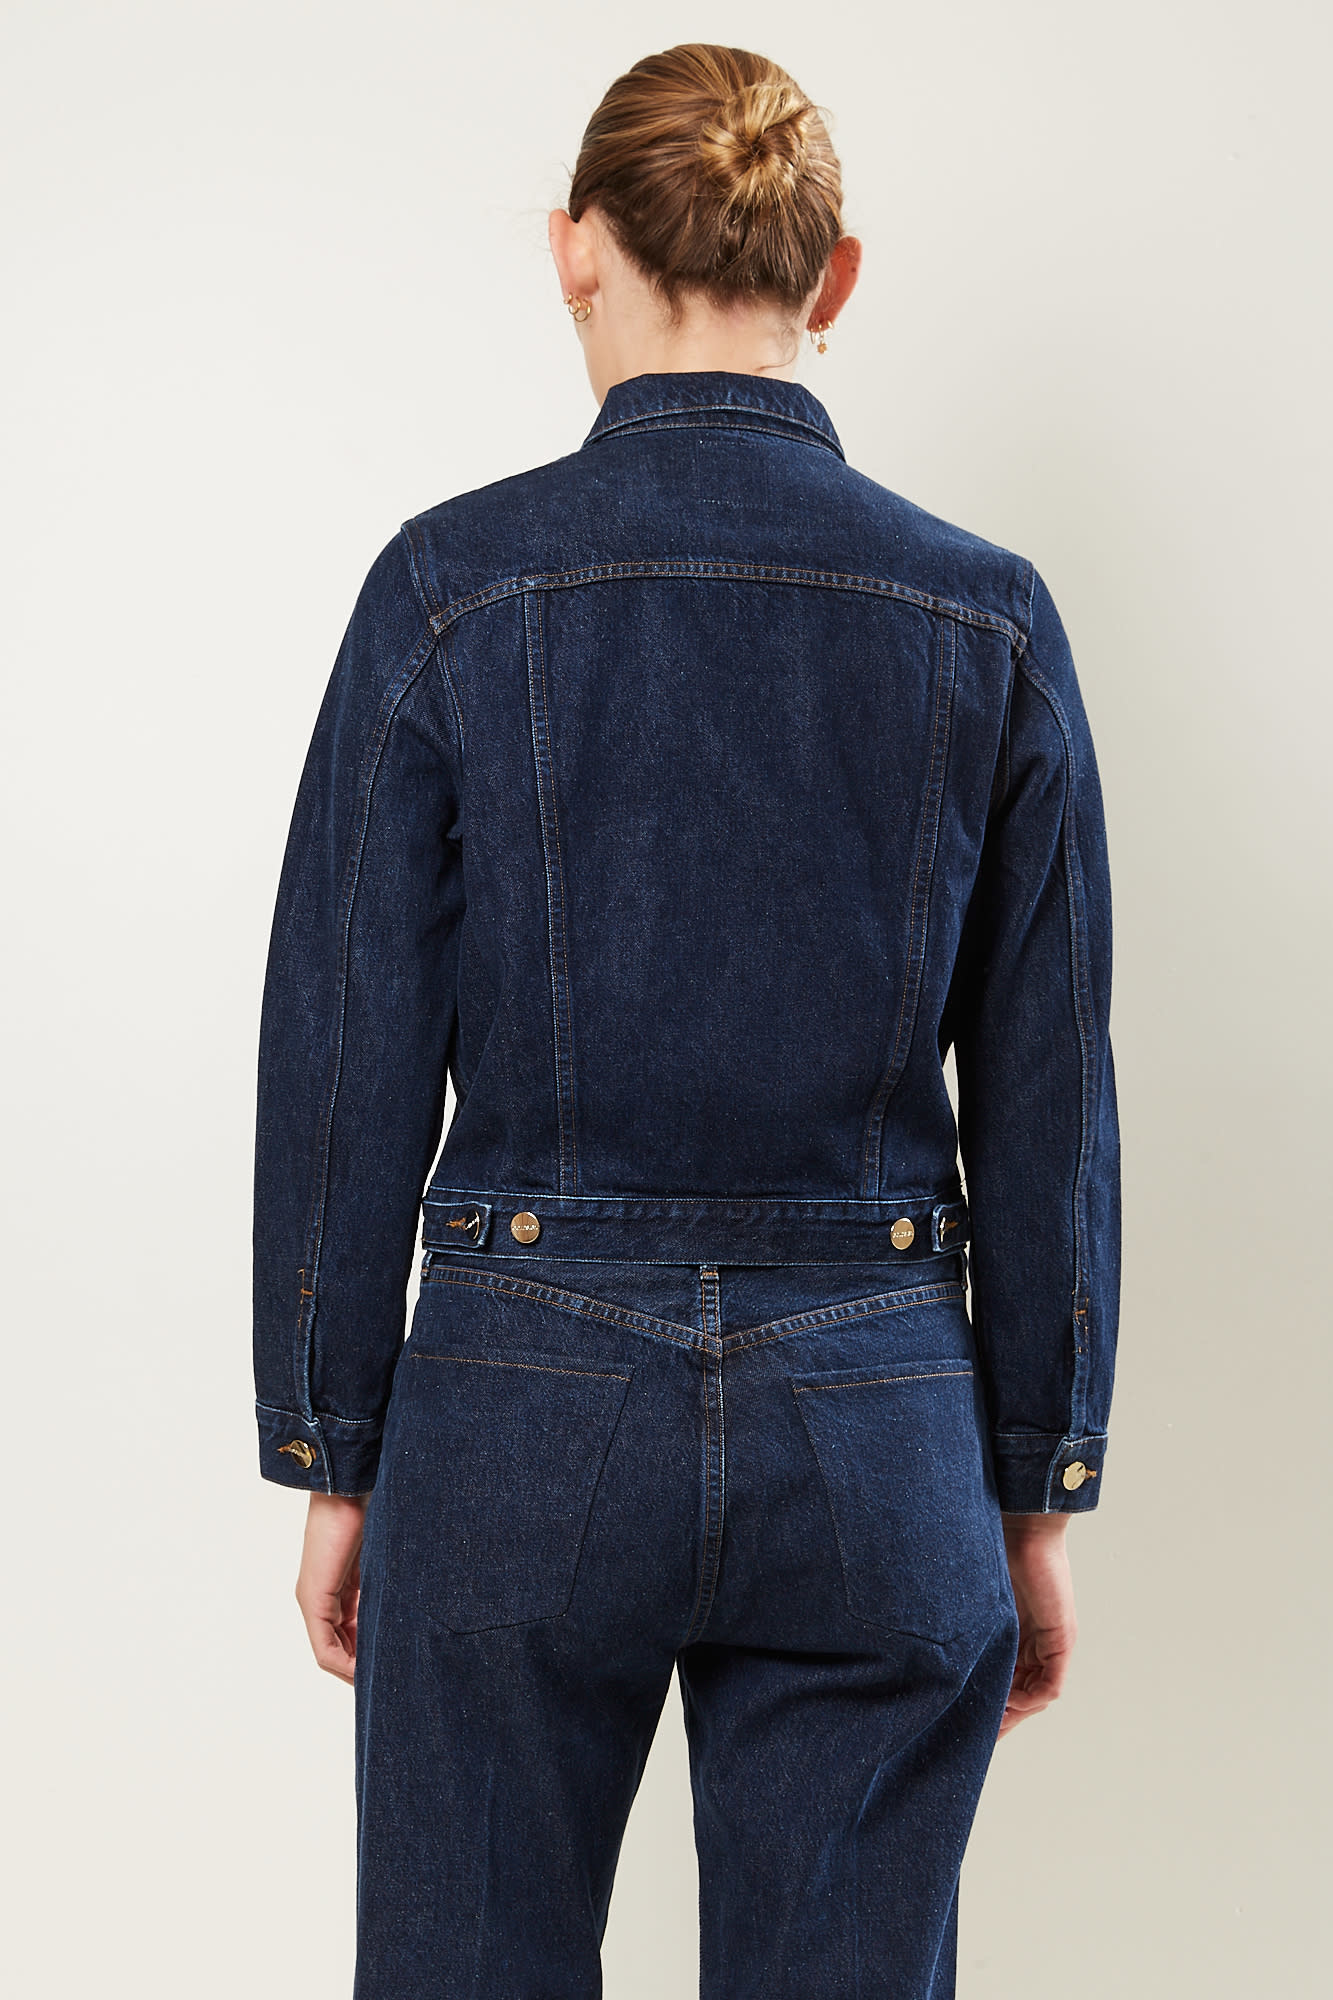 Goldsign - Pleat Jacket